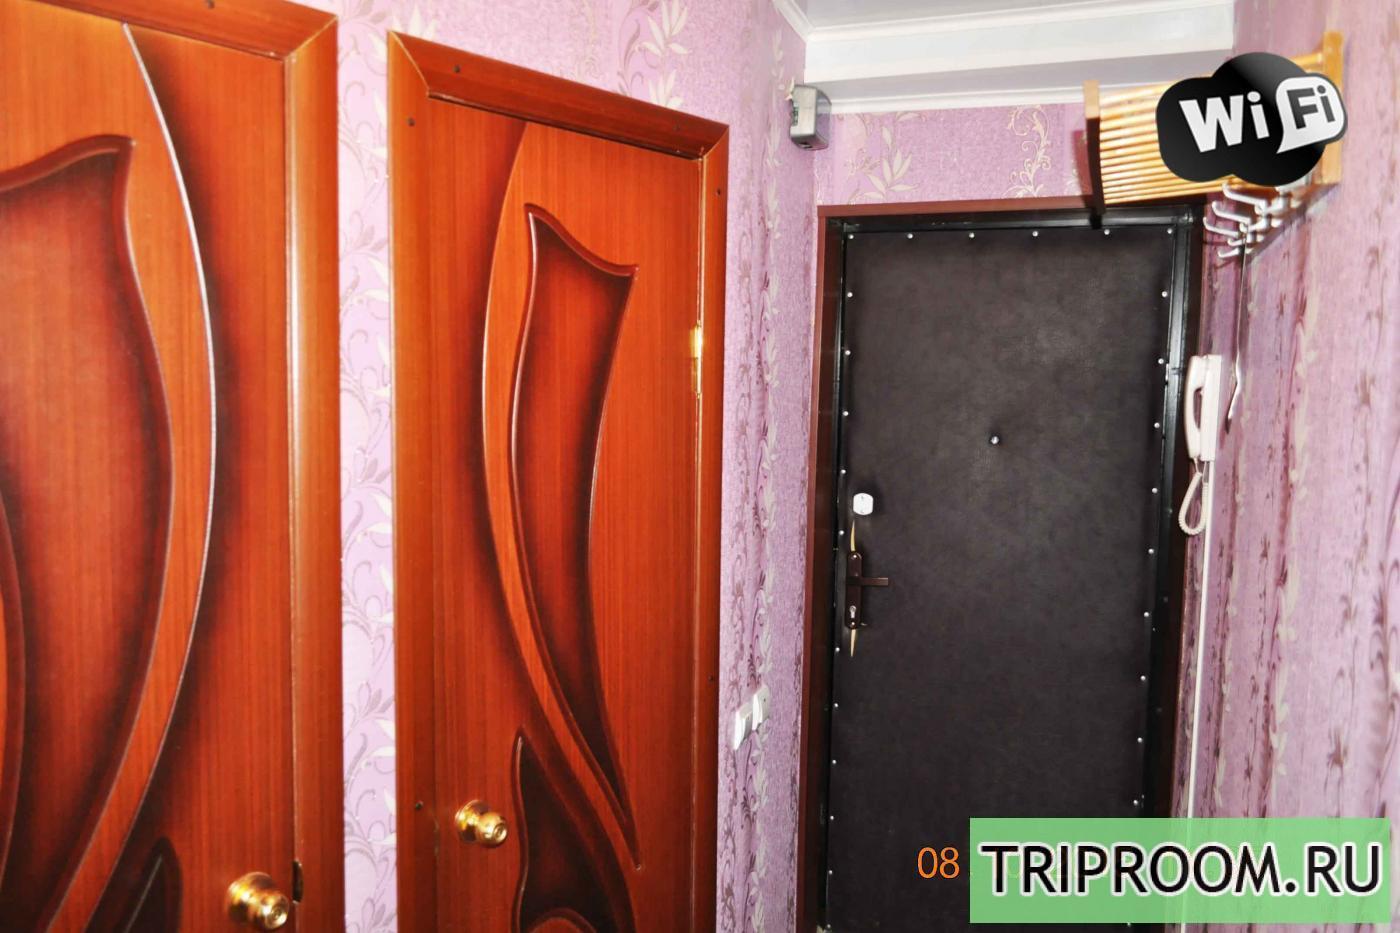 2-комнатная квартира посуточно (вариант № 11708), ул. Амосова улица, фото № 1